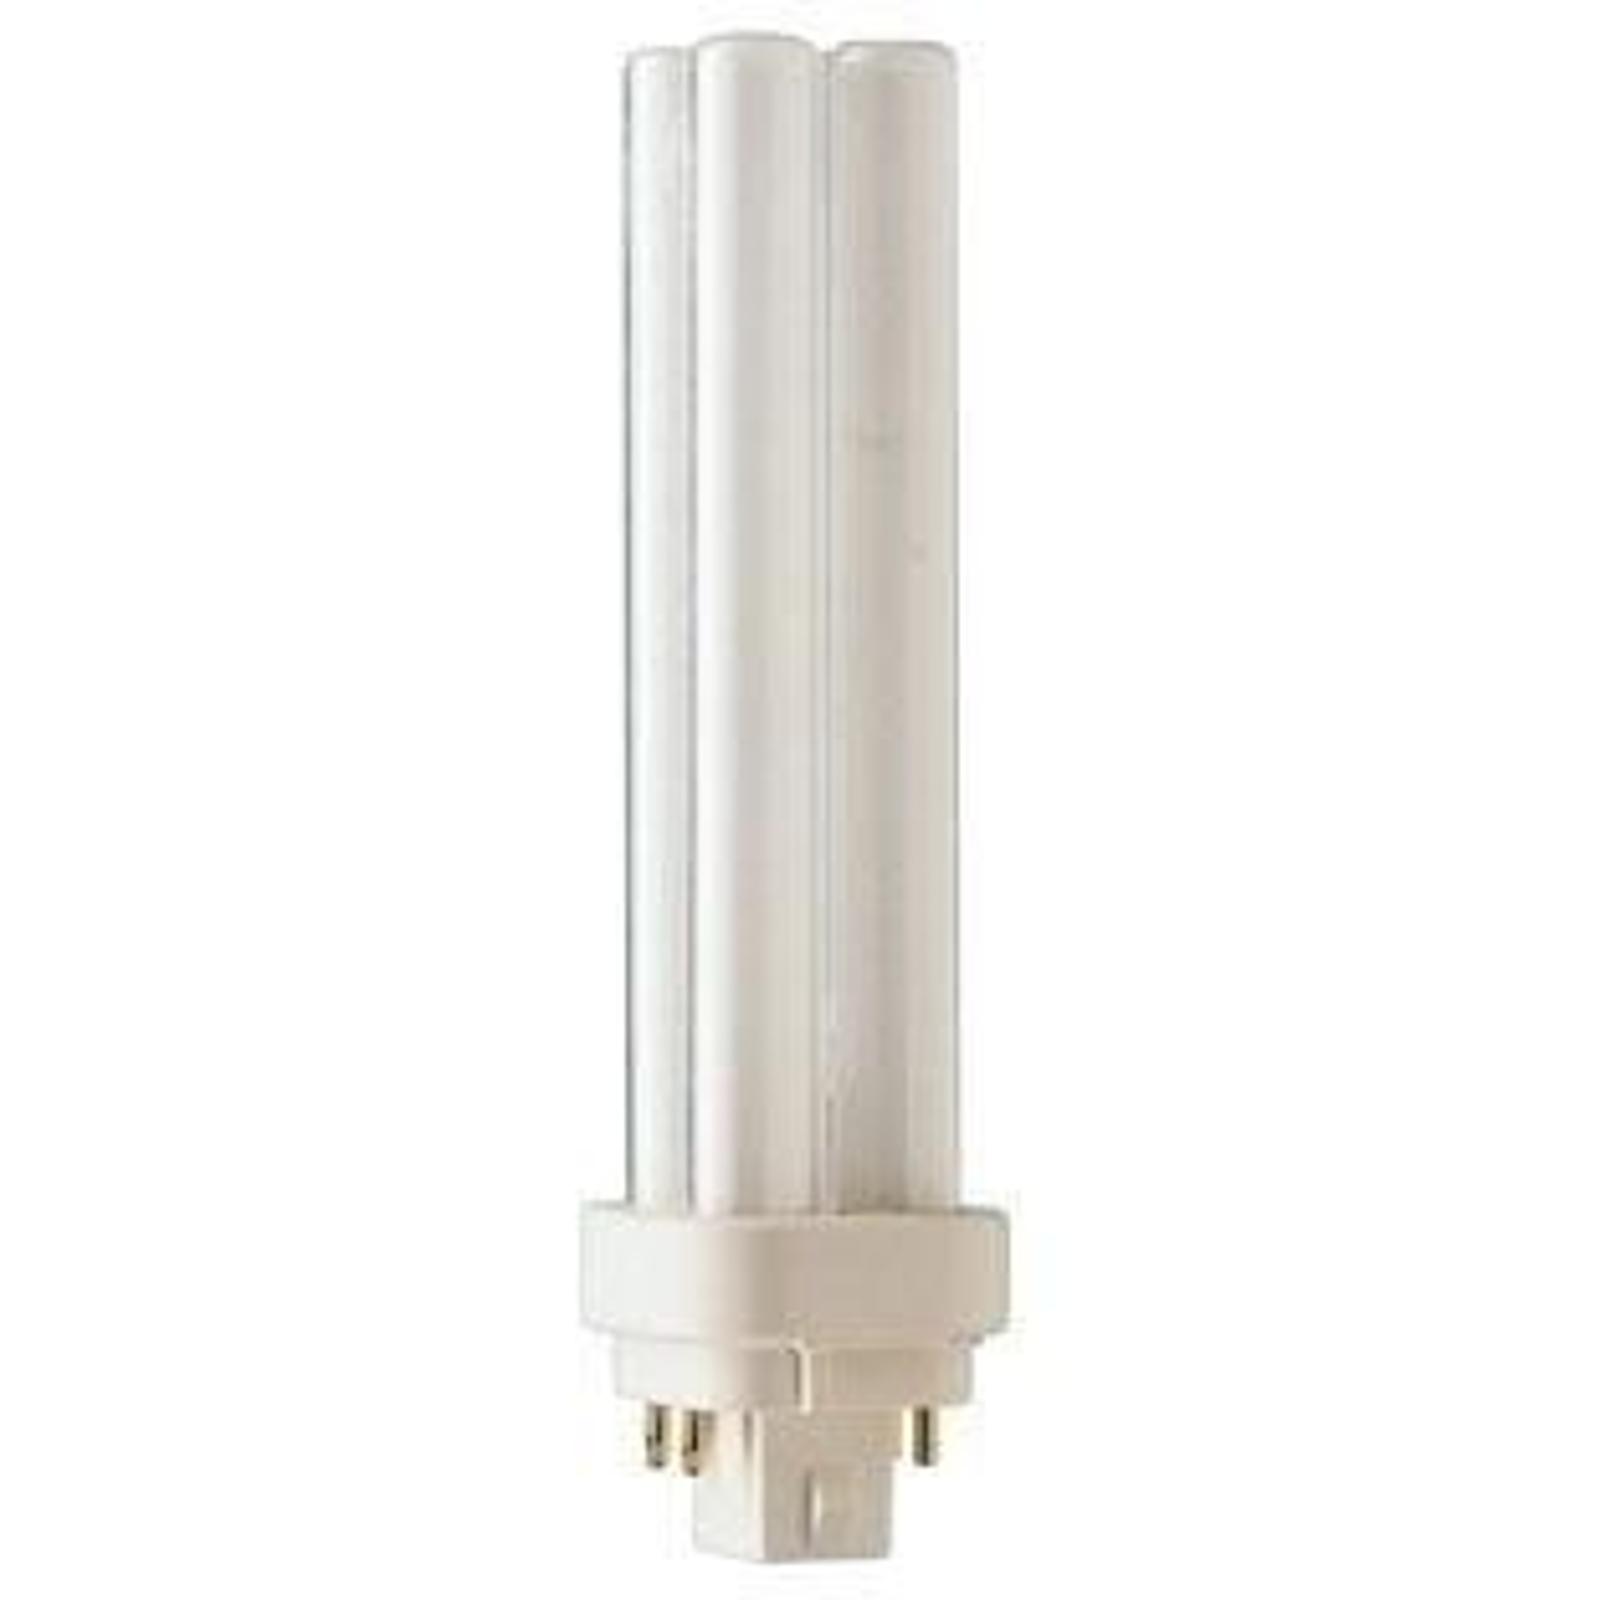 G24q 26W 830 Kompaktleuchtstofflampe DULUX D/E